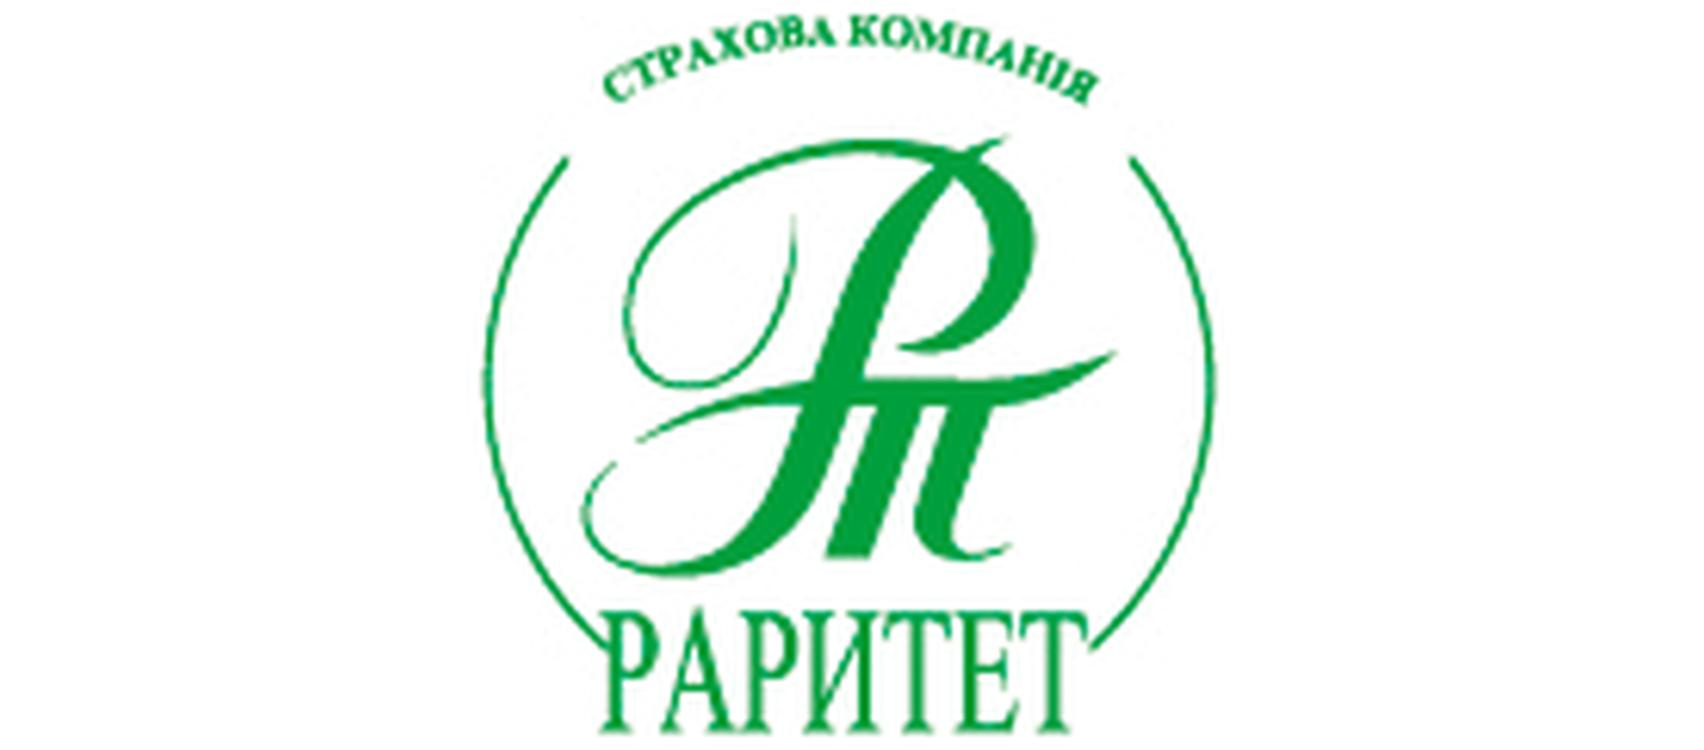 СК РАРИТЕТ